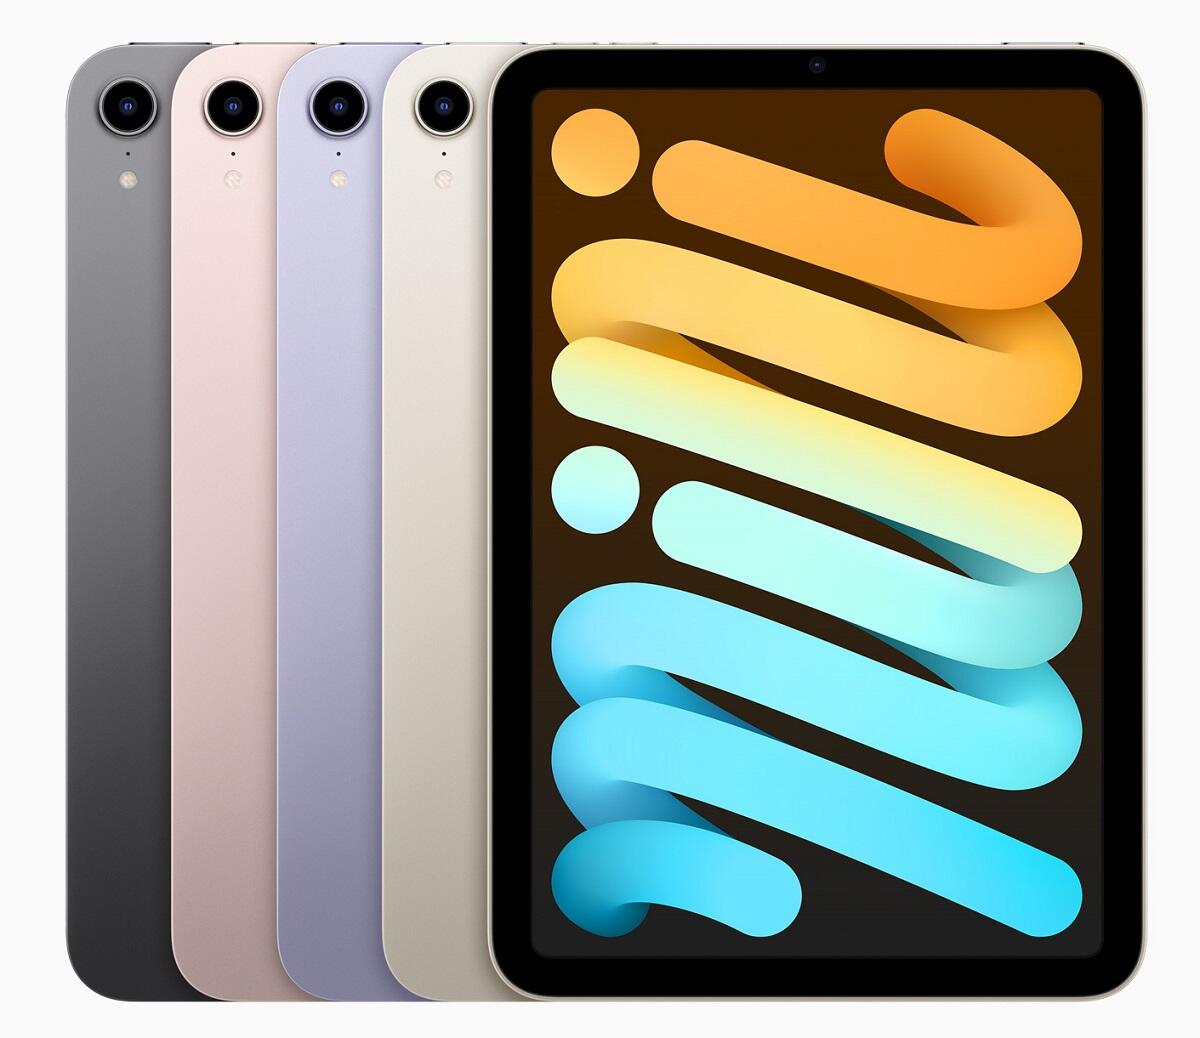 apple-ipad-mini-tablet-preorder-deals-walmart.jpg